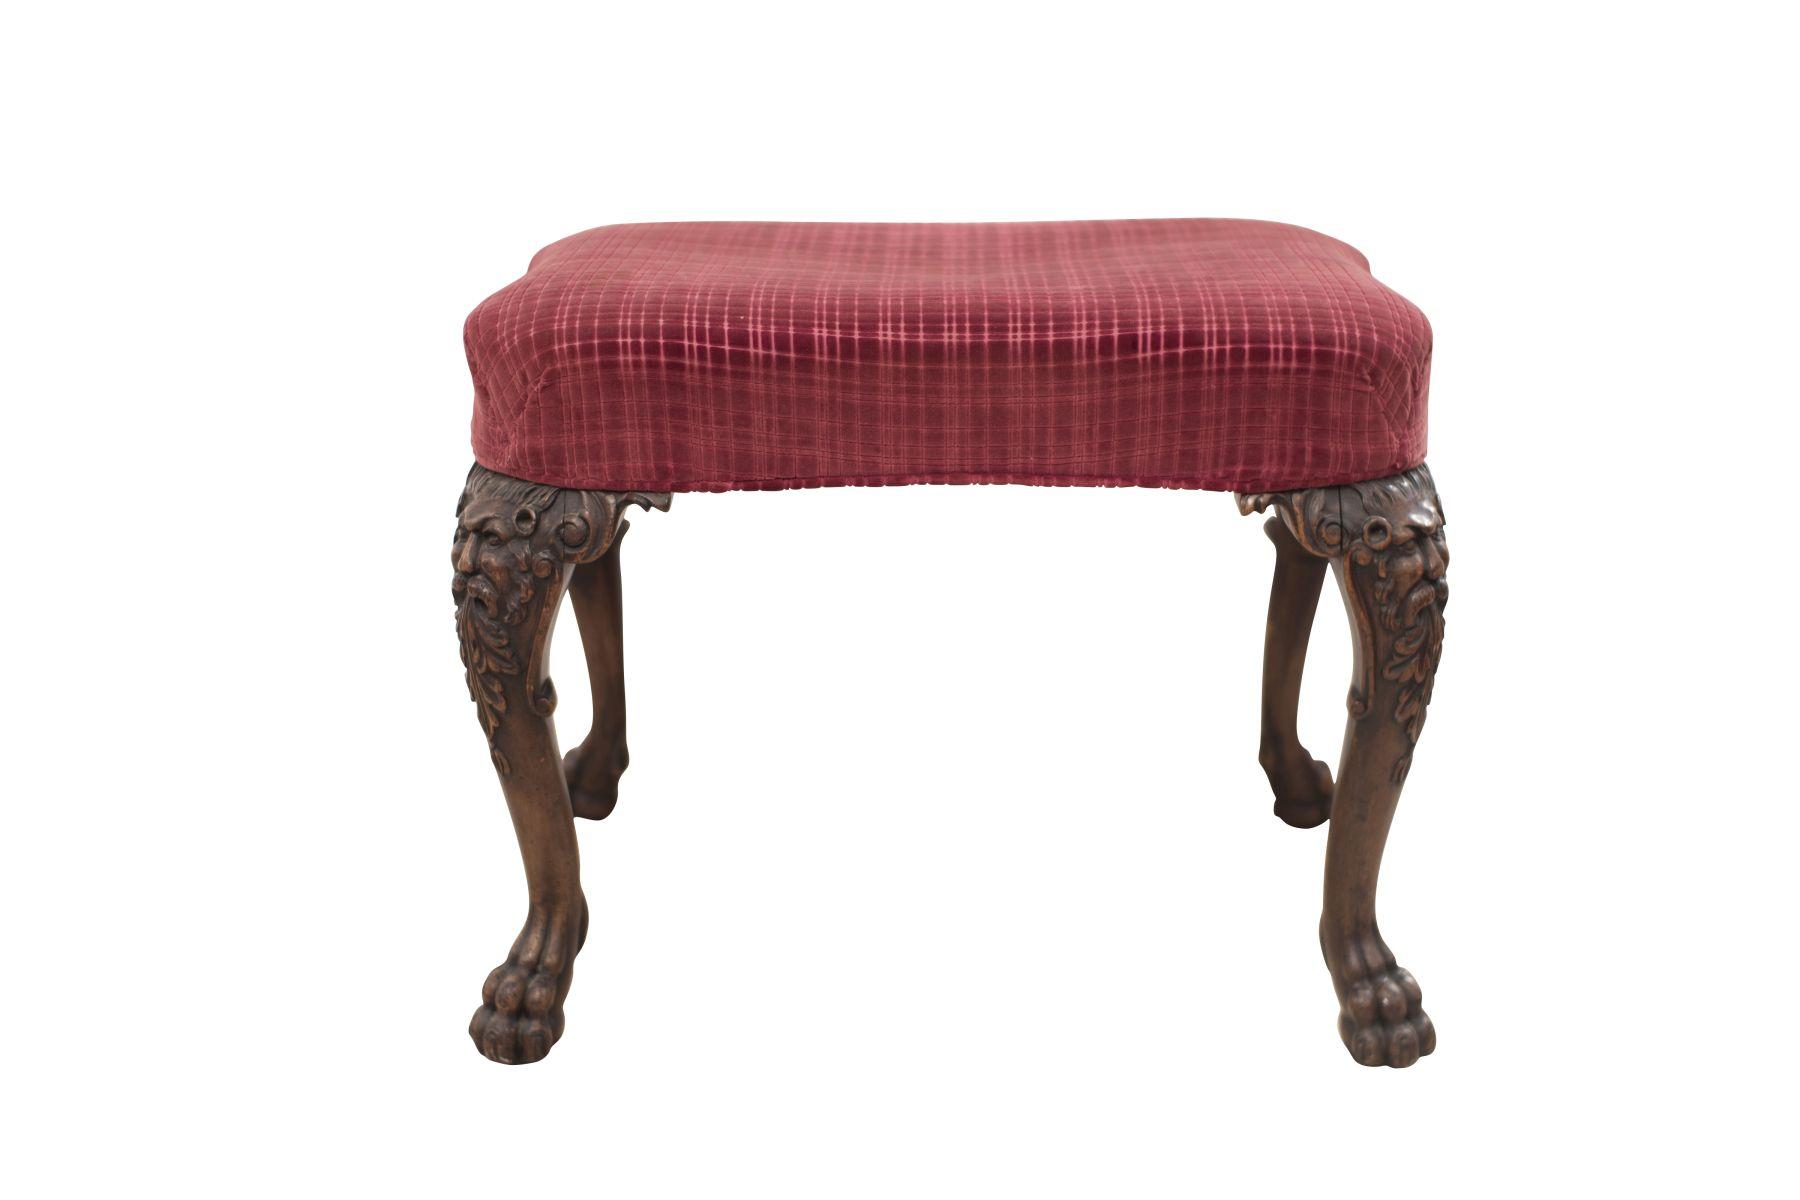 #104 Piano stool second half of the 19th century | Klavierhocker 2. Hälfte des 19. Jahrhundert Image